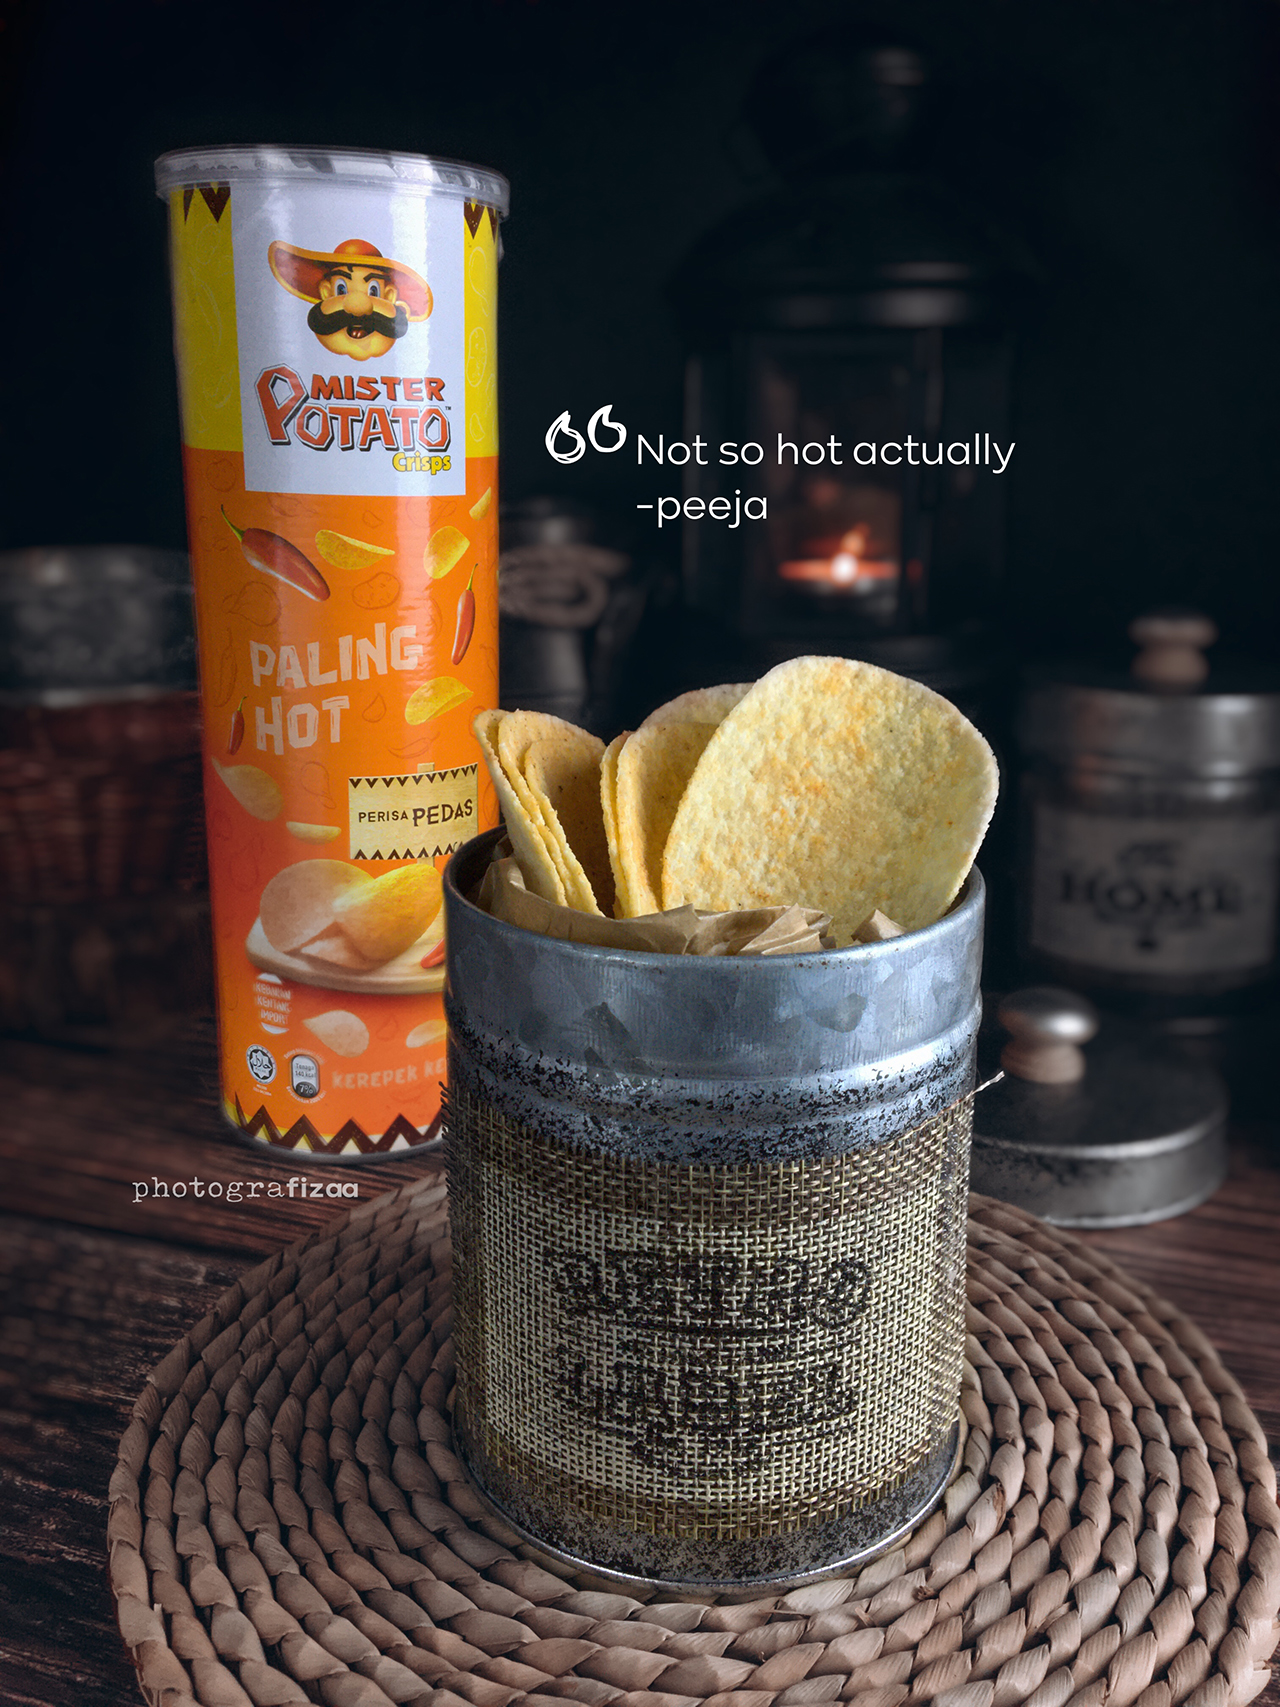 Mister Potato Paling Hot